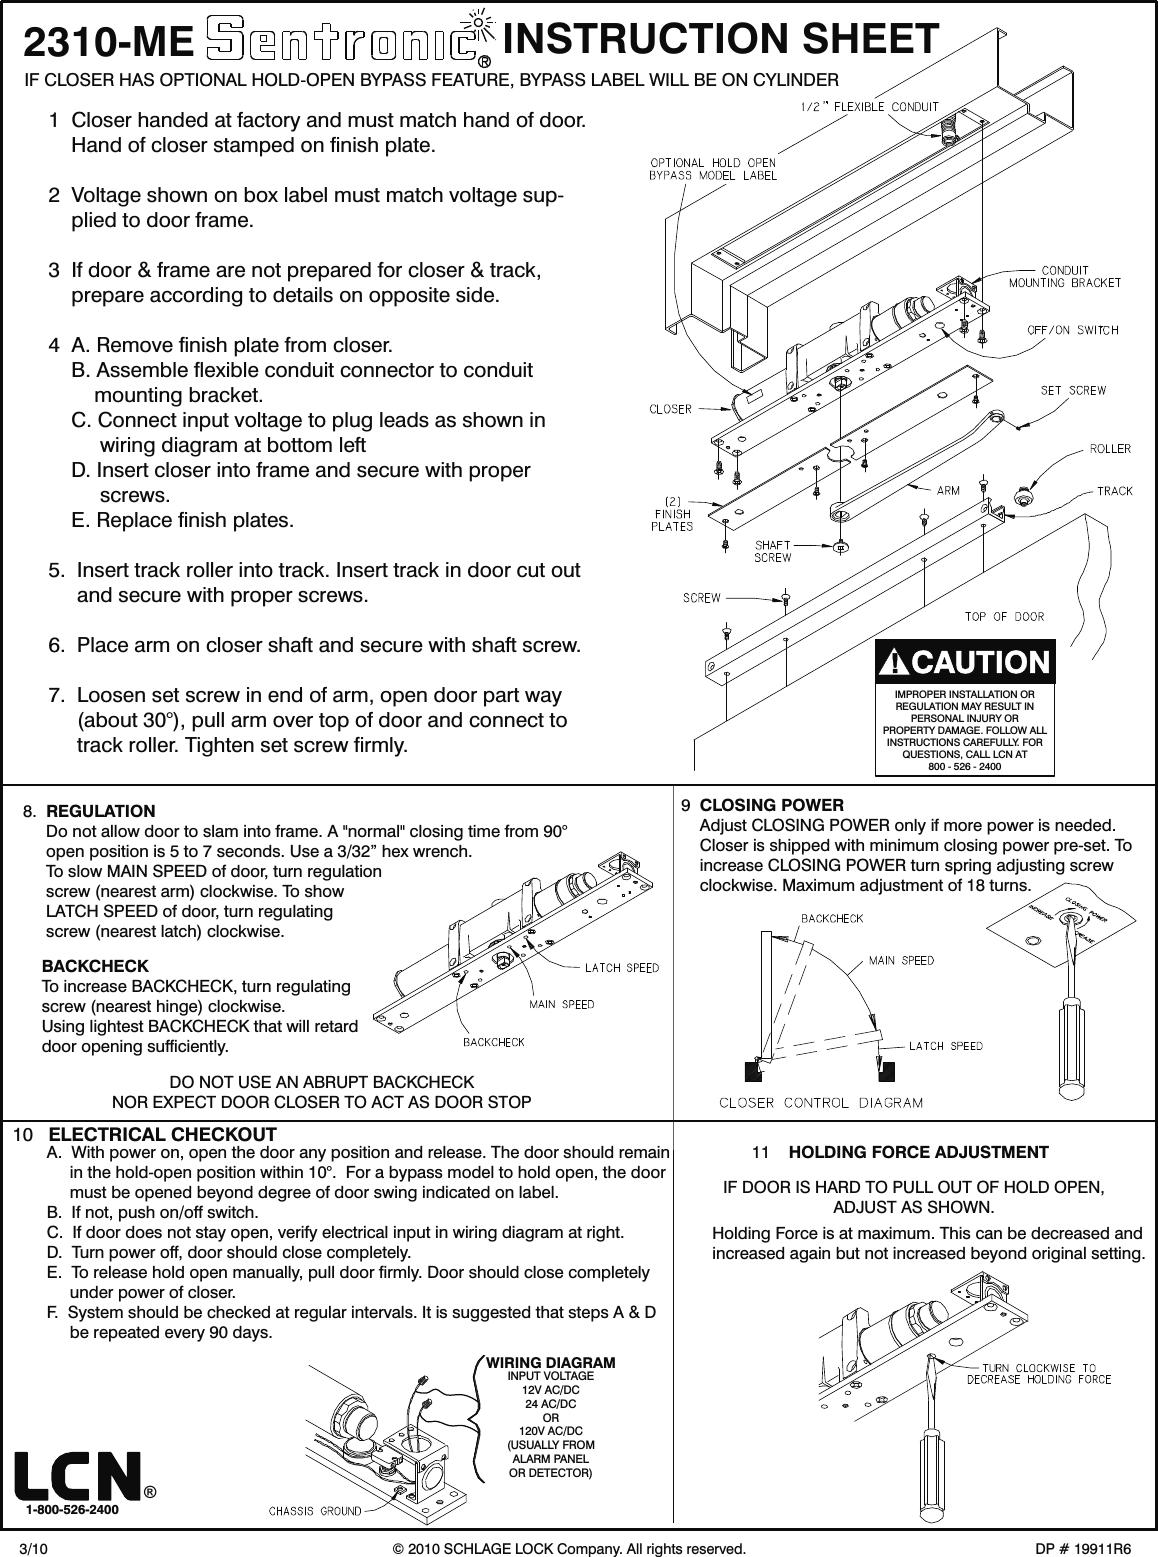 wrg 0704] switch for gm part 3895923 wiring schematicslcn besam wiring diagrams lcn lcn_doorcontrols_firelifesafetyseries_2310me_instructionsinstallation_19911 2310me installation guide lcn2310meinstallation